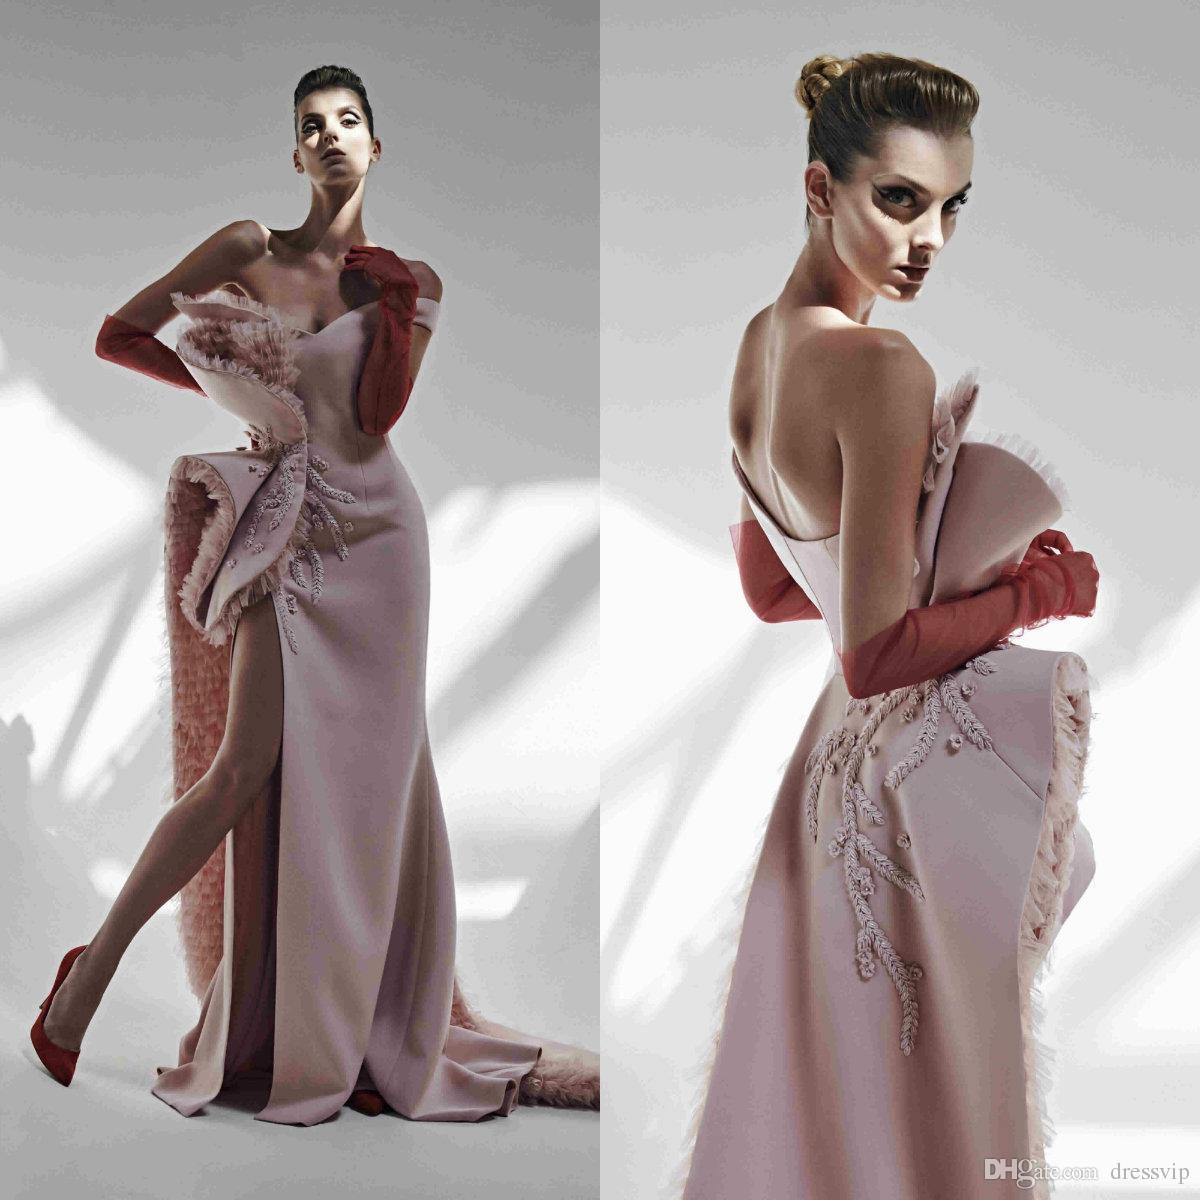 2020 Azzi & Osta Pink Evening Dresses Tulle Sweetheart Sweep Train Embroidery Mermaid Prom Dress Custom Made High Split Robes De Soirée